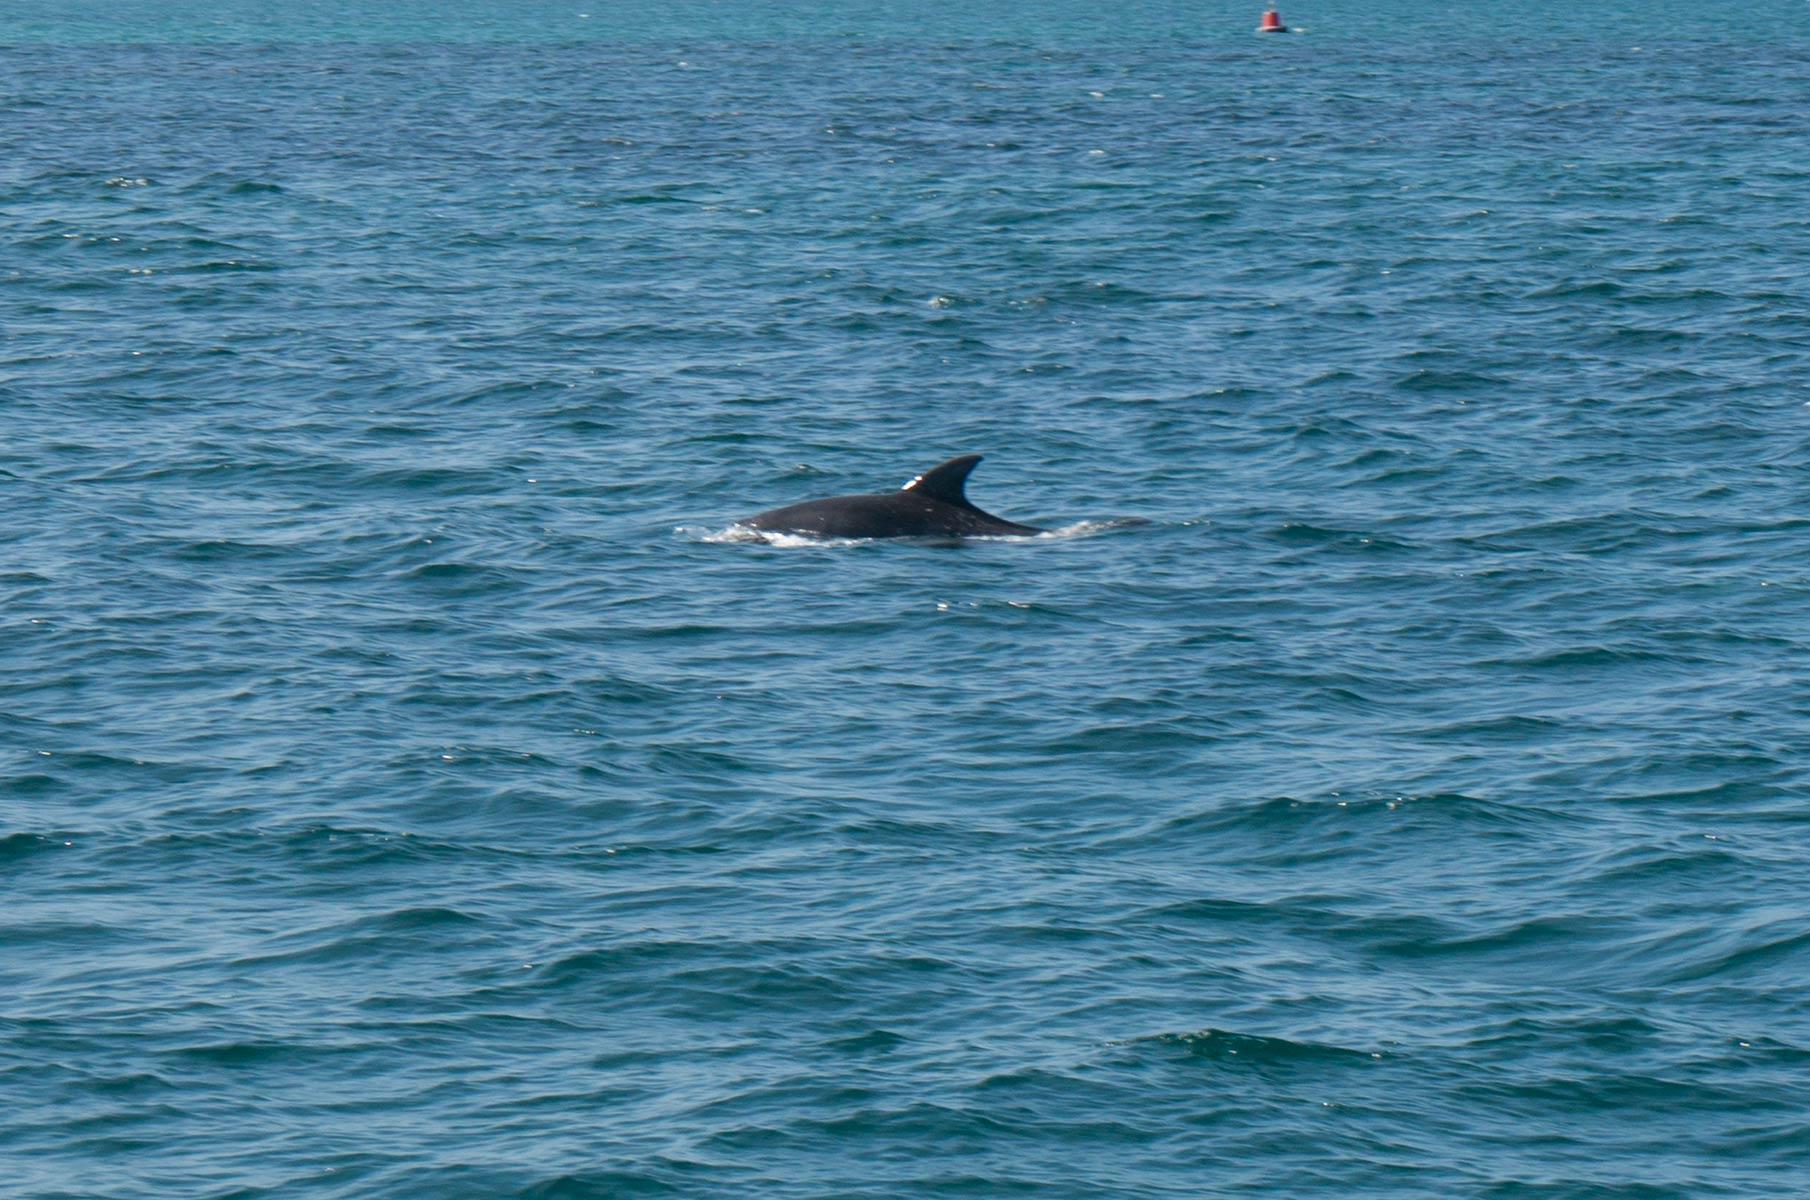 Delfine in der Jervis Bay, Australien